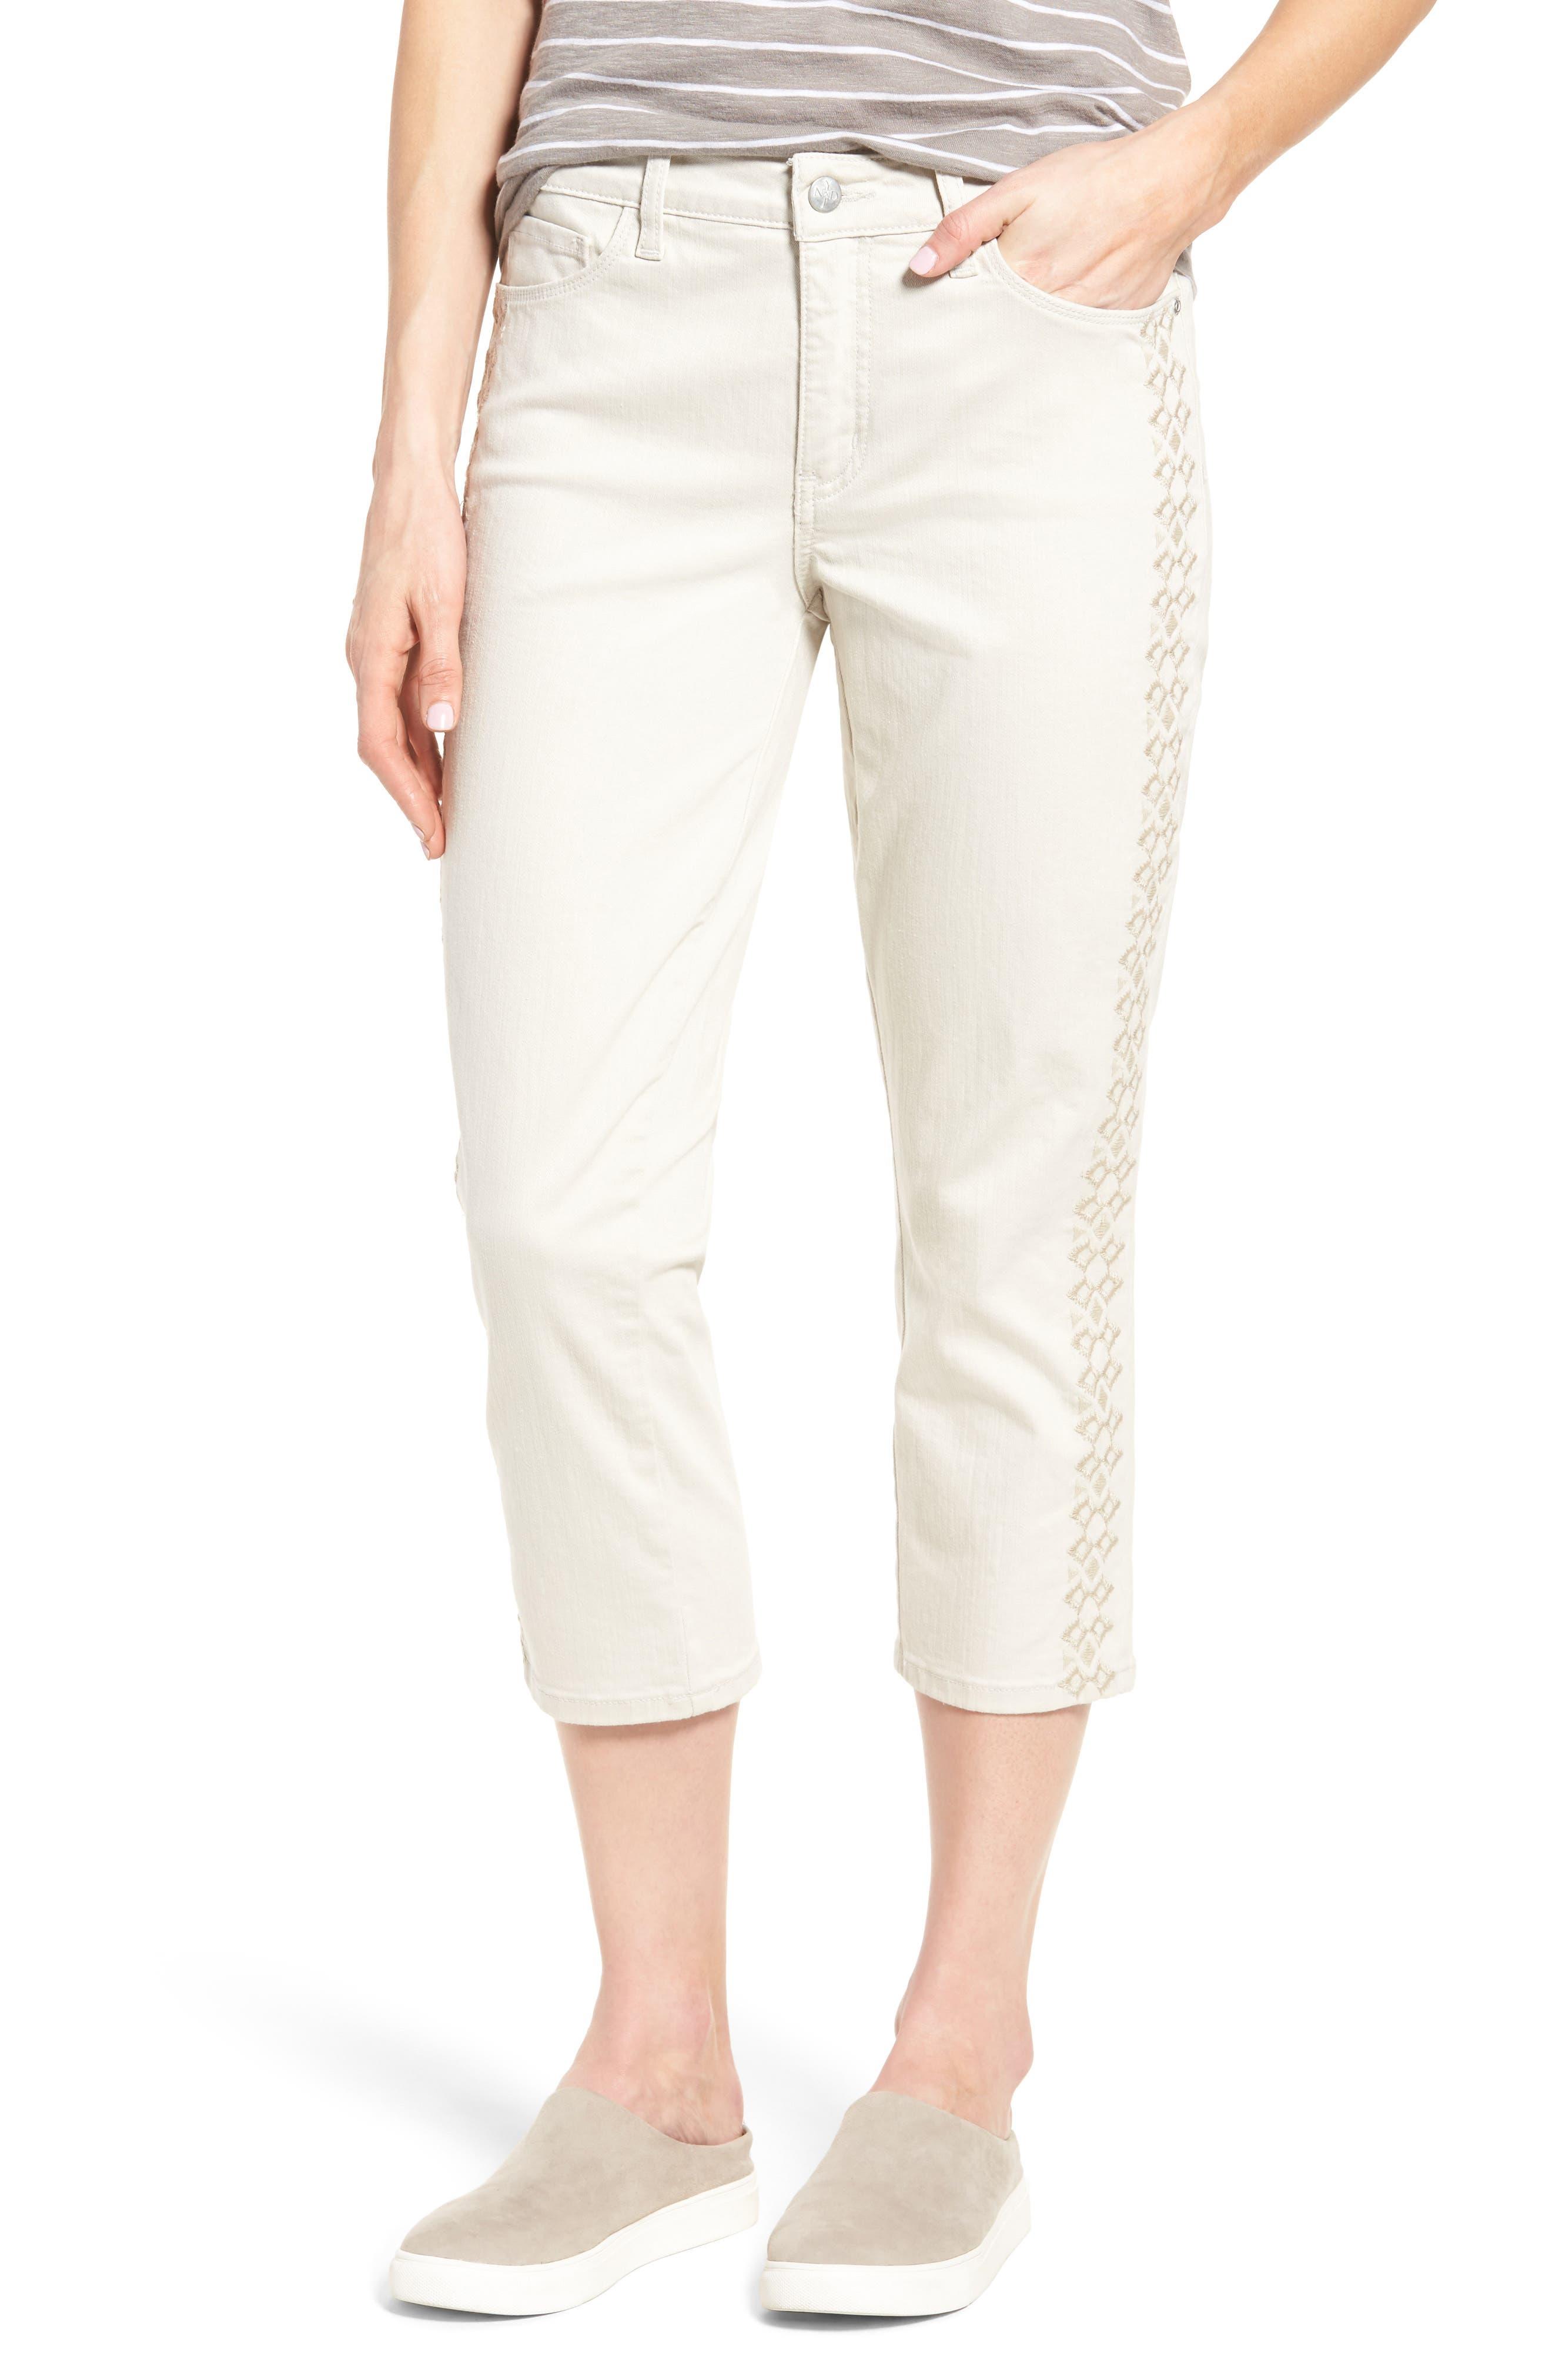 Main Image - NYDJ Alina Embroidered Stretch Capri Jeans